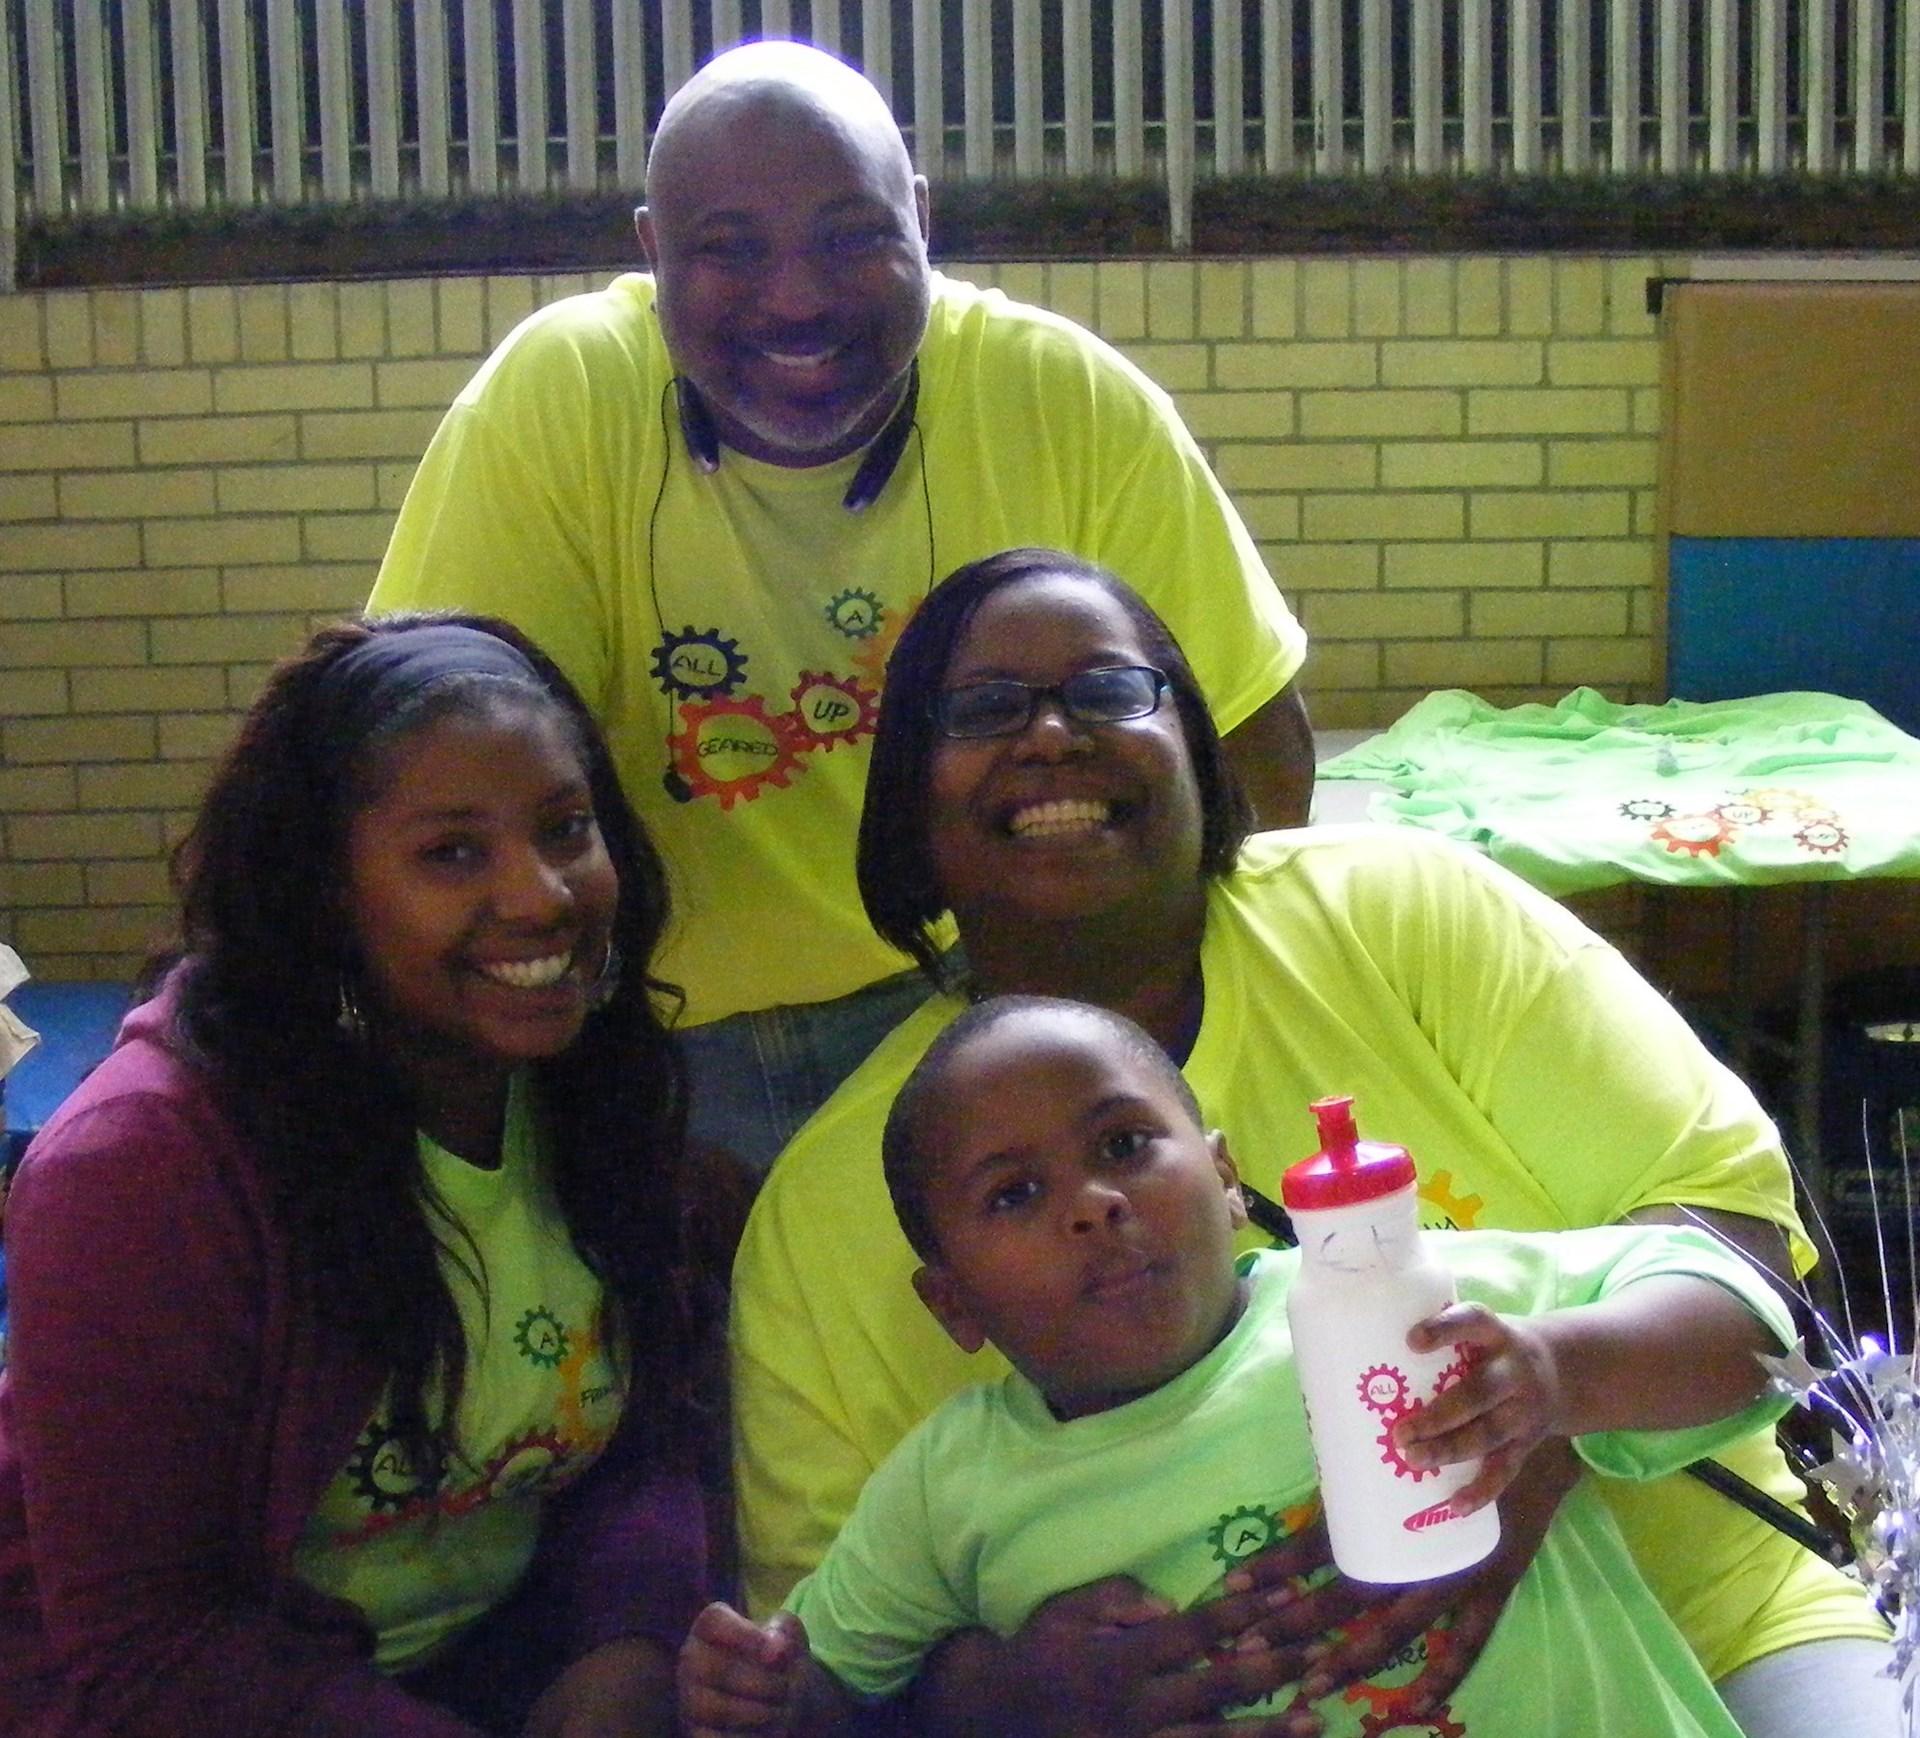 Event organizer Darren Carter and family